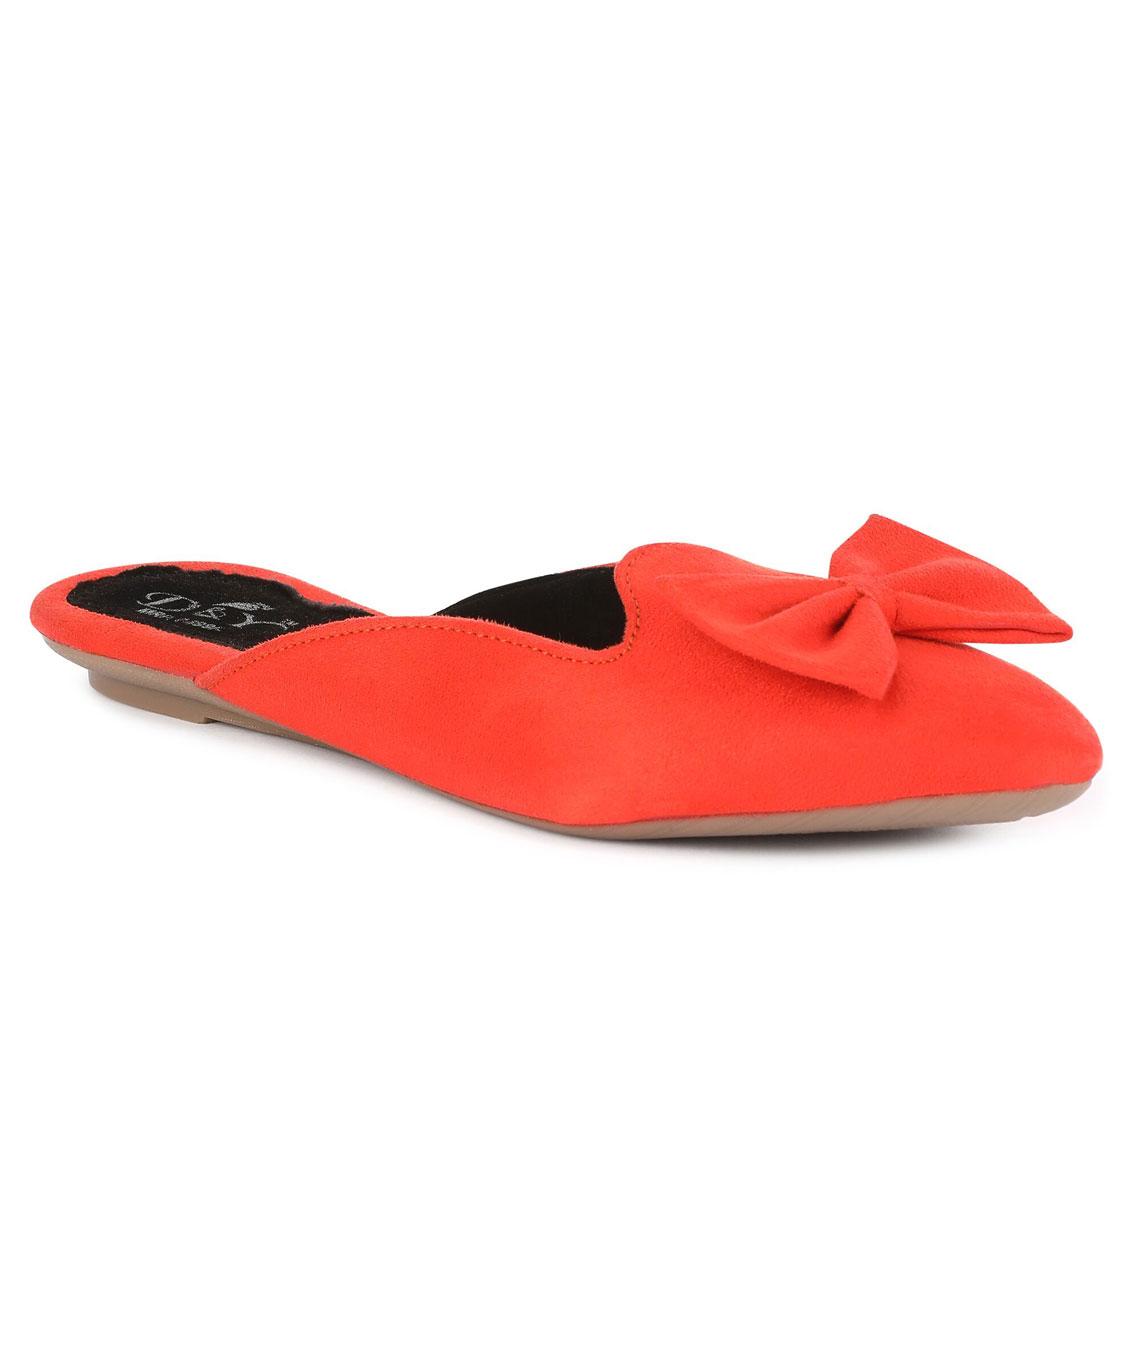 Sindhi Footwear Women`s Orange Rexin Casual Ballerinas